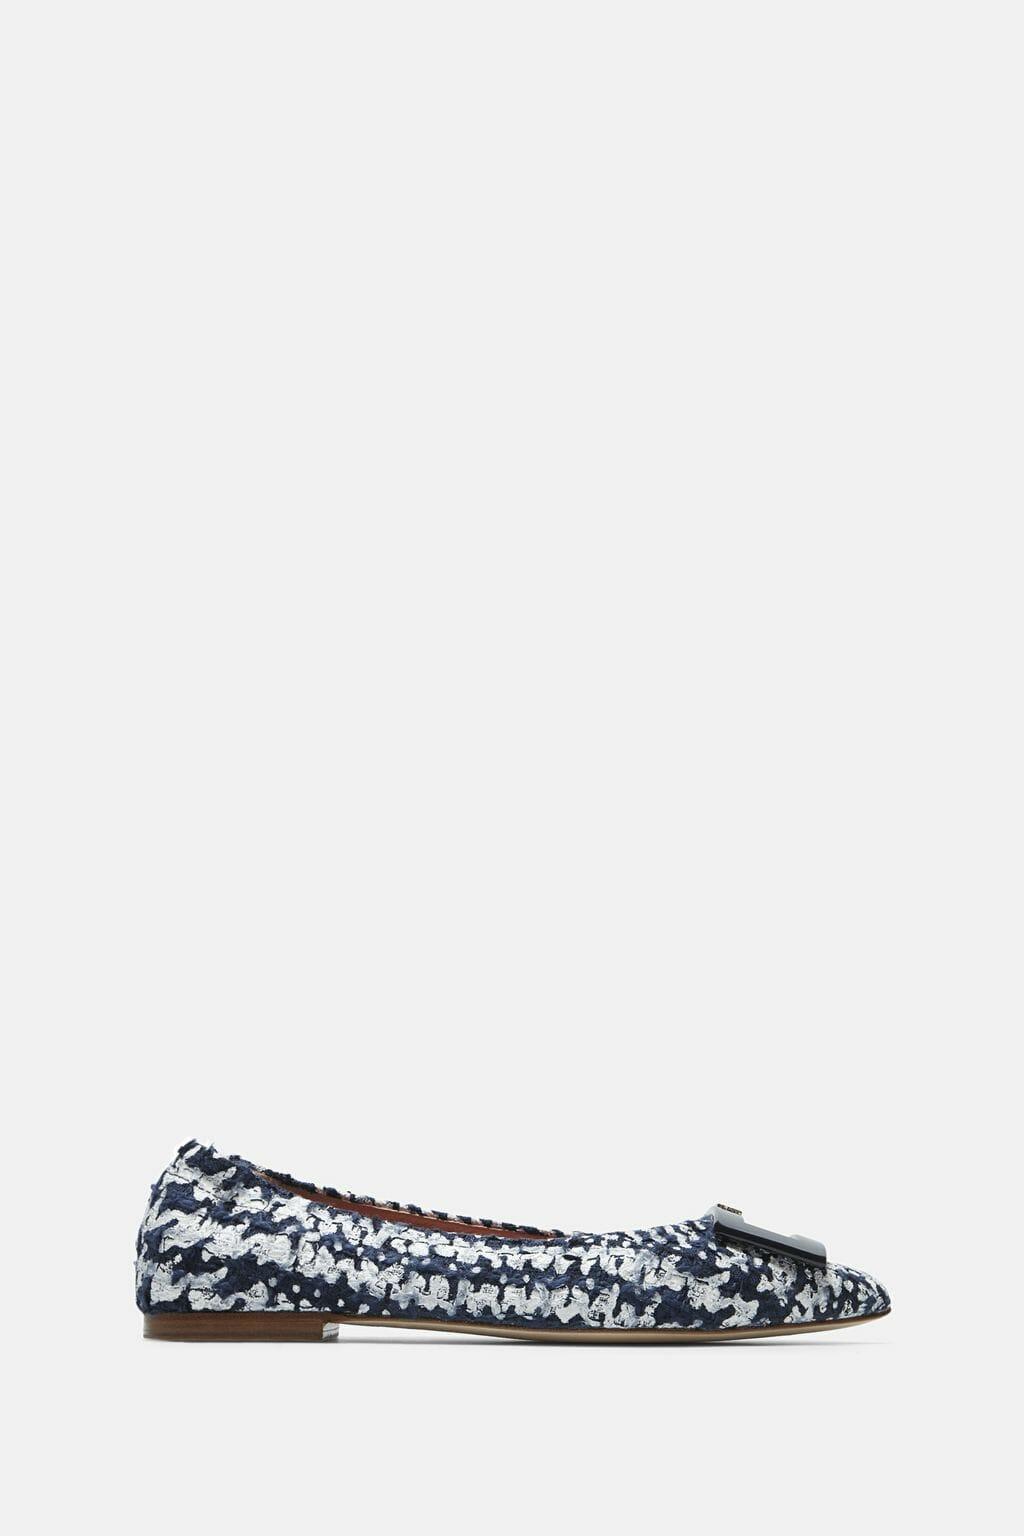 CH-Carolina-herrera-shoes-collection-Spring-Summer-2018-shoe-69